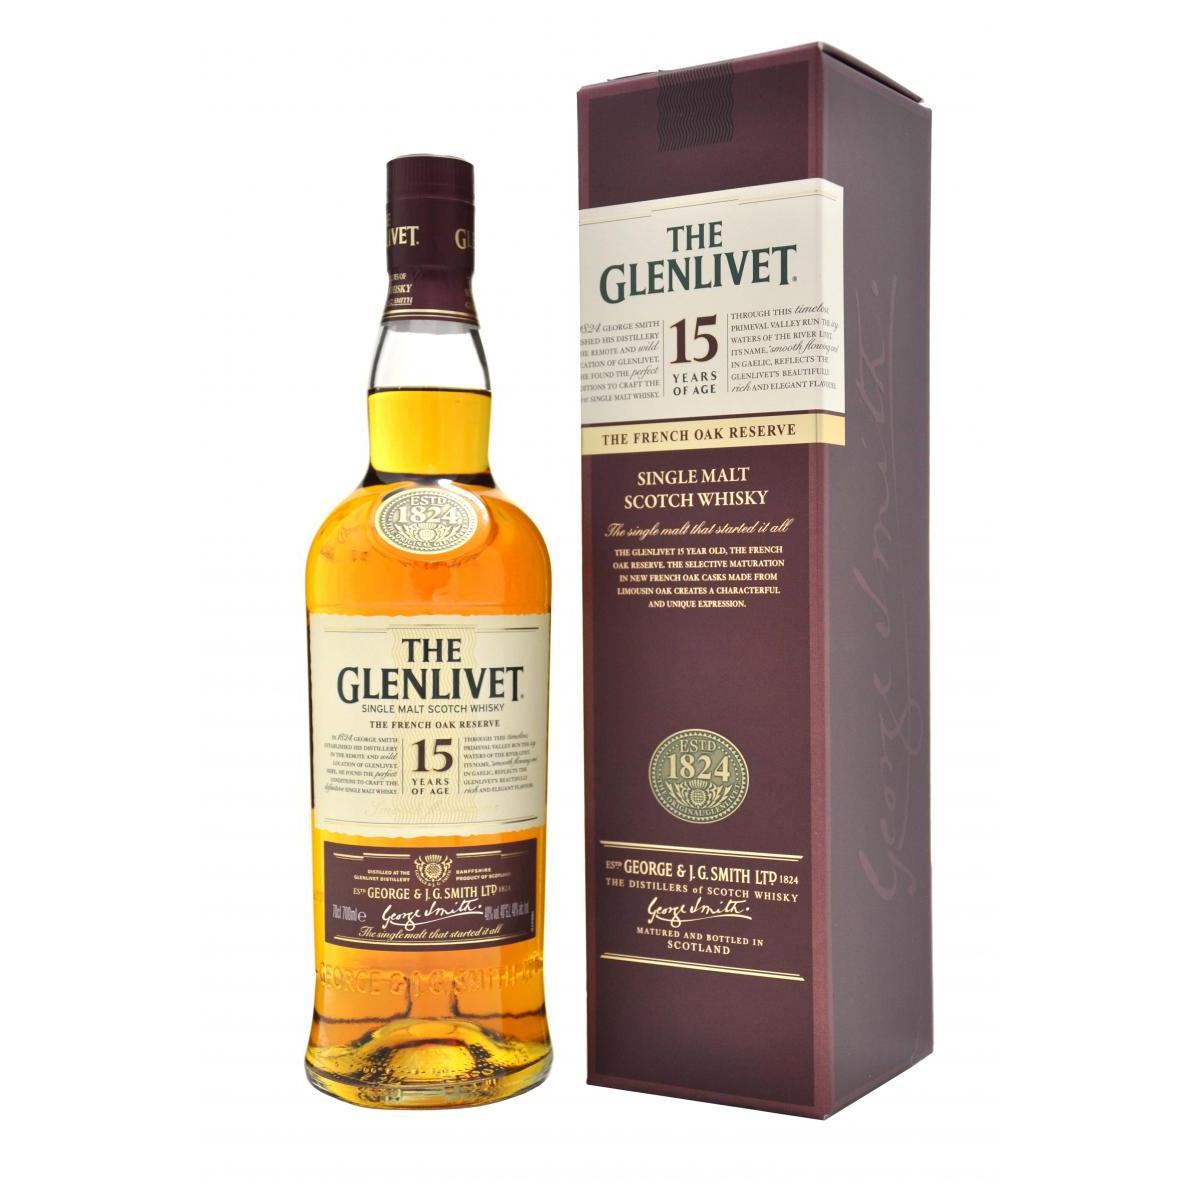 The Glenlivet 15 Year Old French Oak Reserve Whisky - 700ML